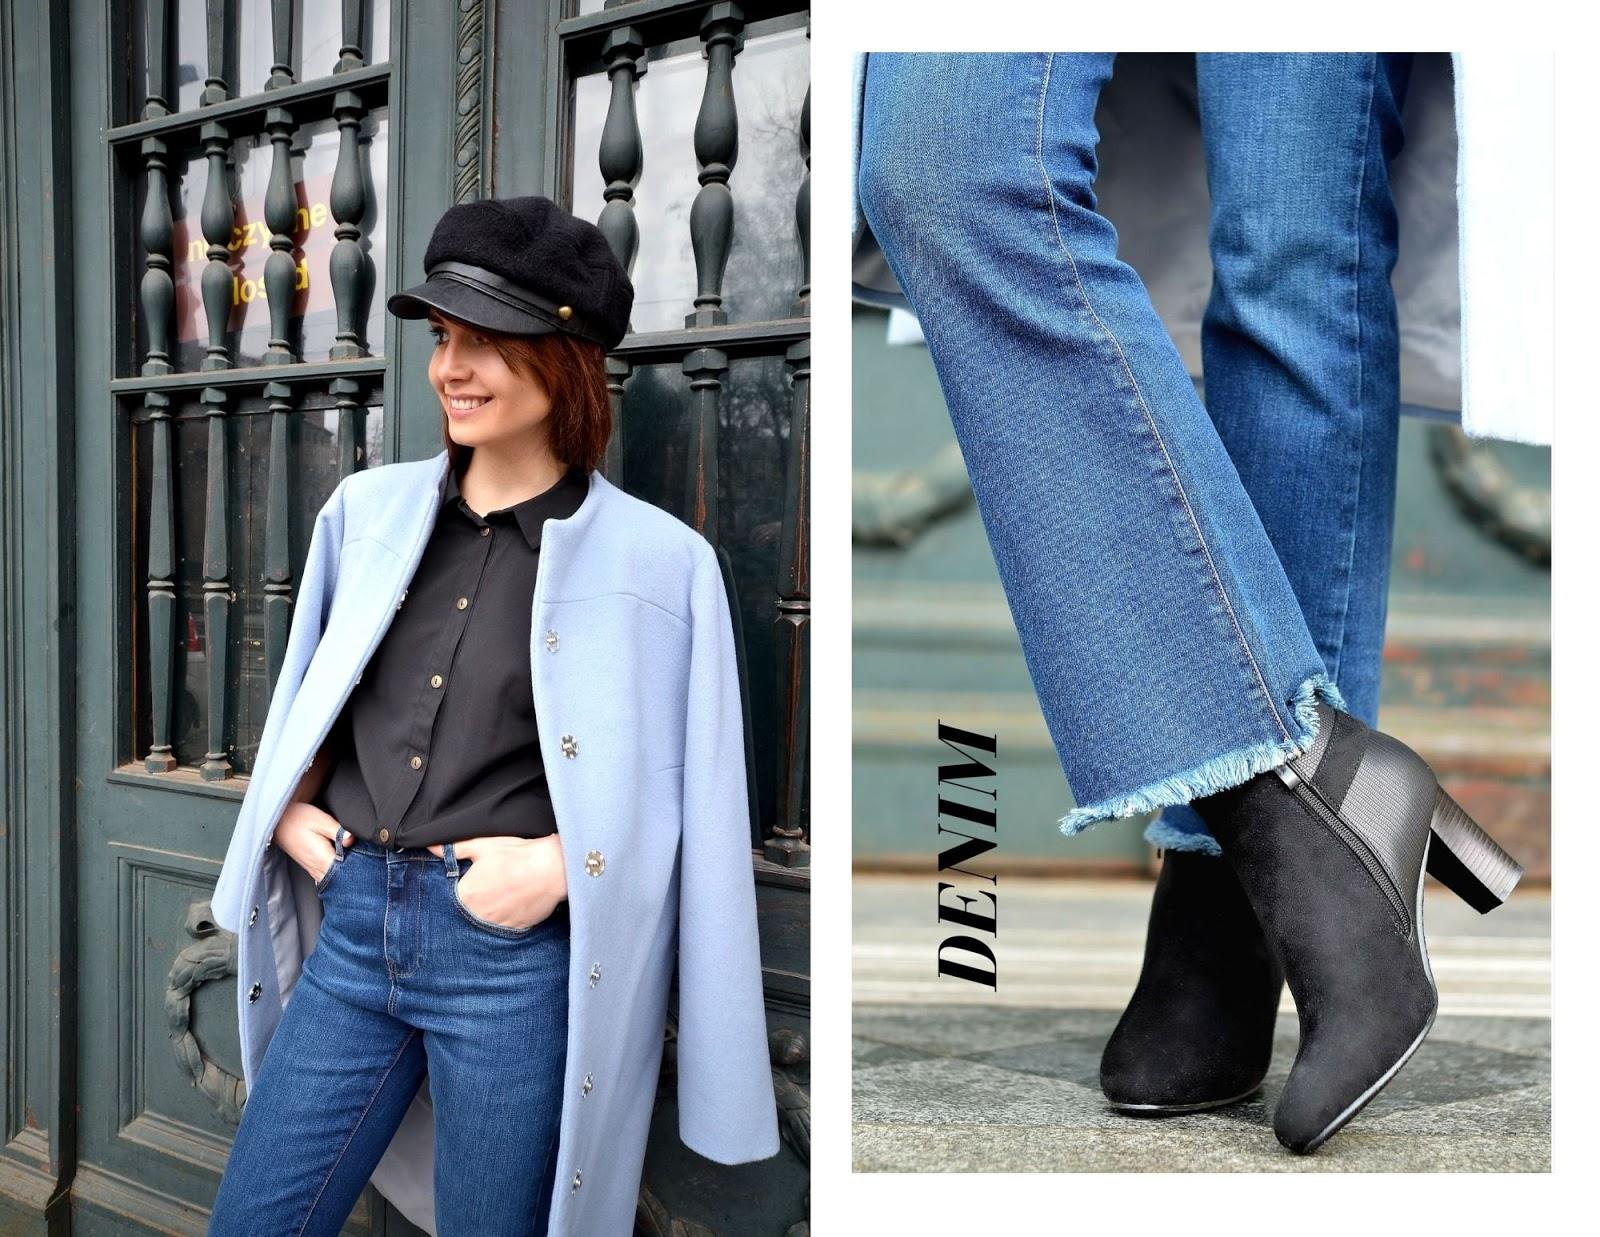 blogi modowe | blog lifestylowy | cammy blog | spodnie do kostek | phillip lim | skorzana torebka | czarna koszula